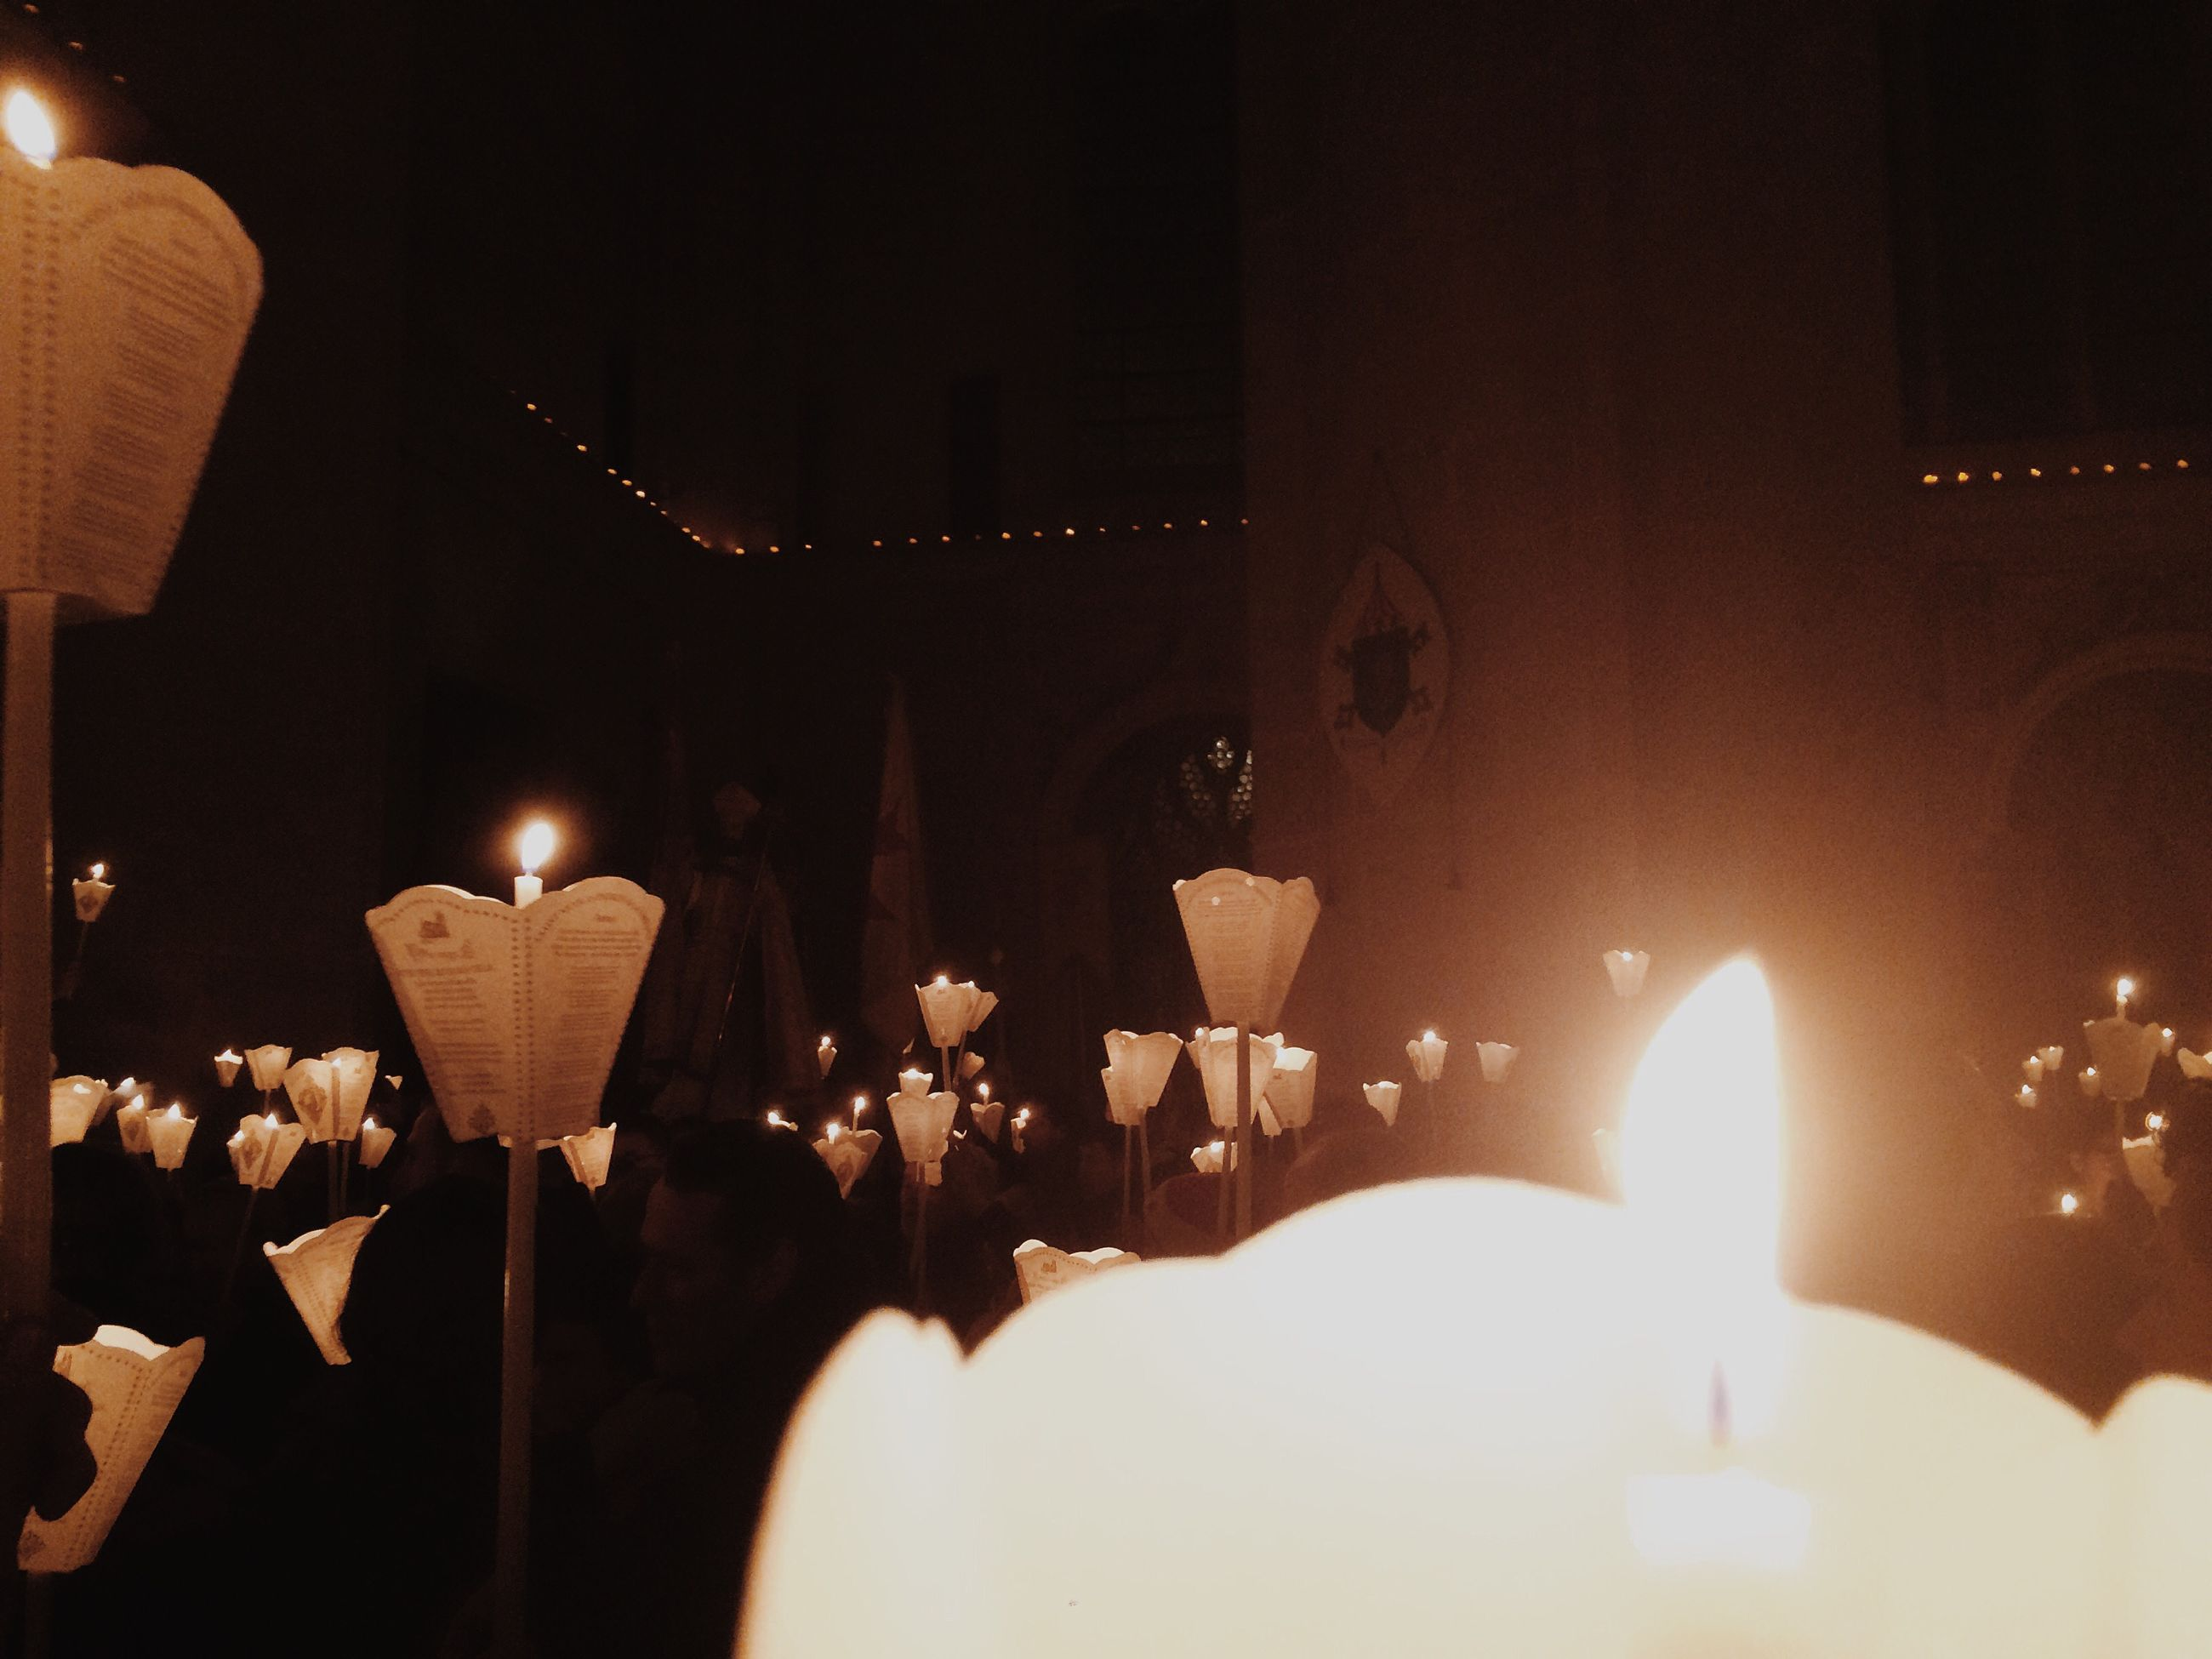 illuminated, night, lighting equipment, lit, glowing, light - natural phenomenon, dark, indoors, candle, built structure, decoration, architecture, burning, flame, electric light, religion, celebration, building exterior, light, street light